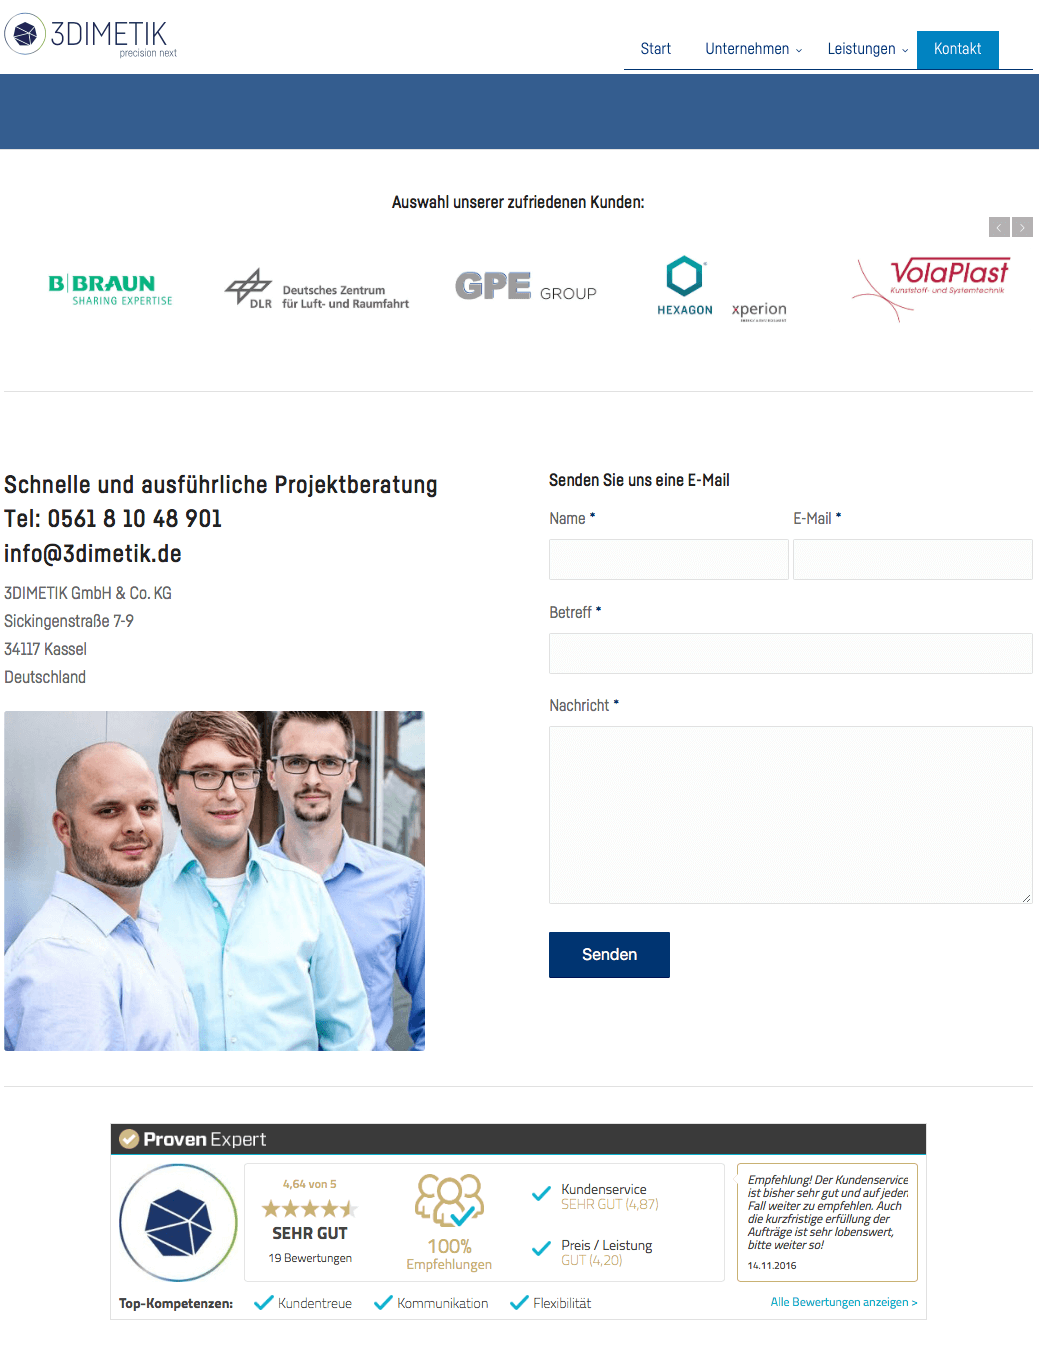 Abbildung 11: Kontaktformular des Unternehmens 3DIMETIK (Quelle: 3DIMETIK1)